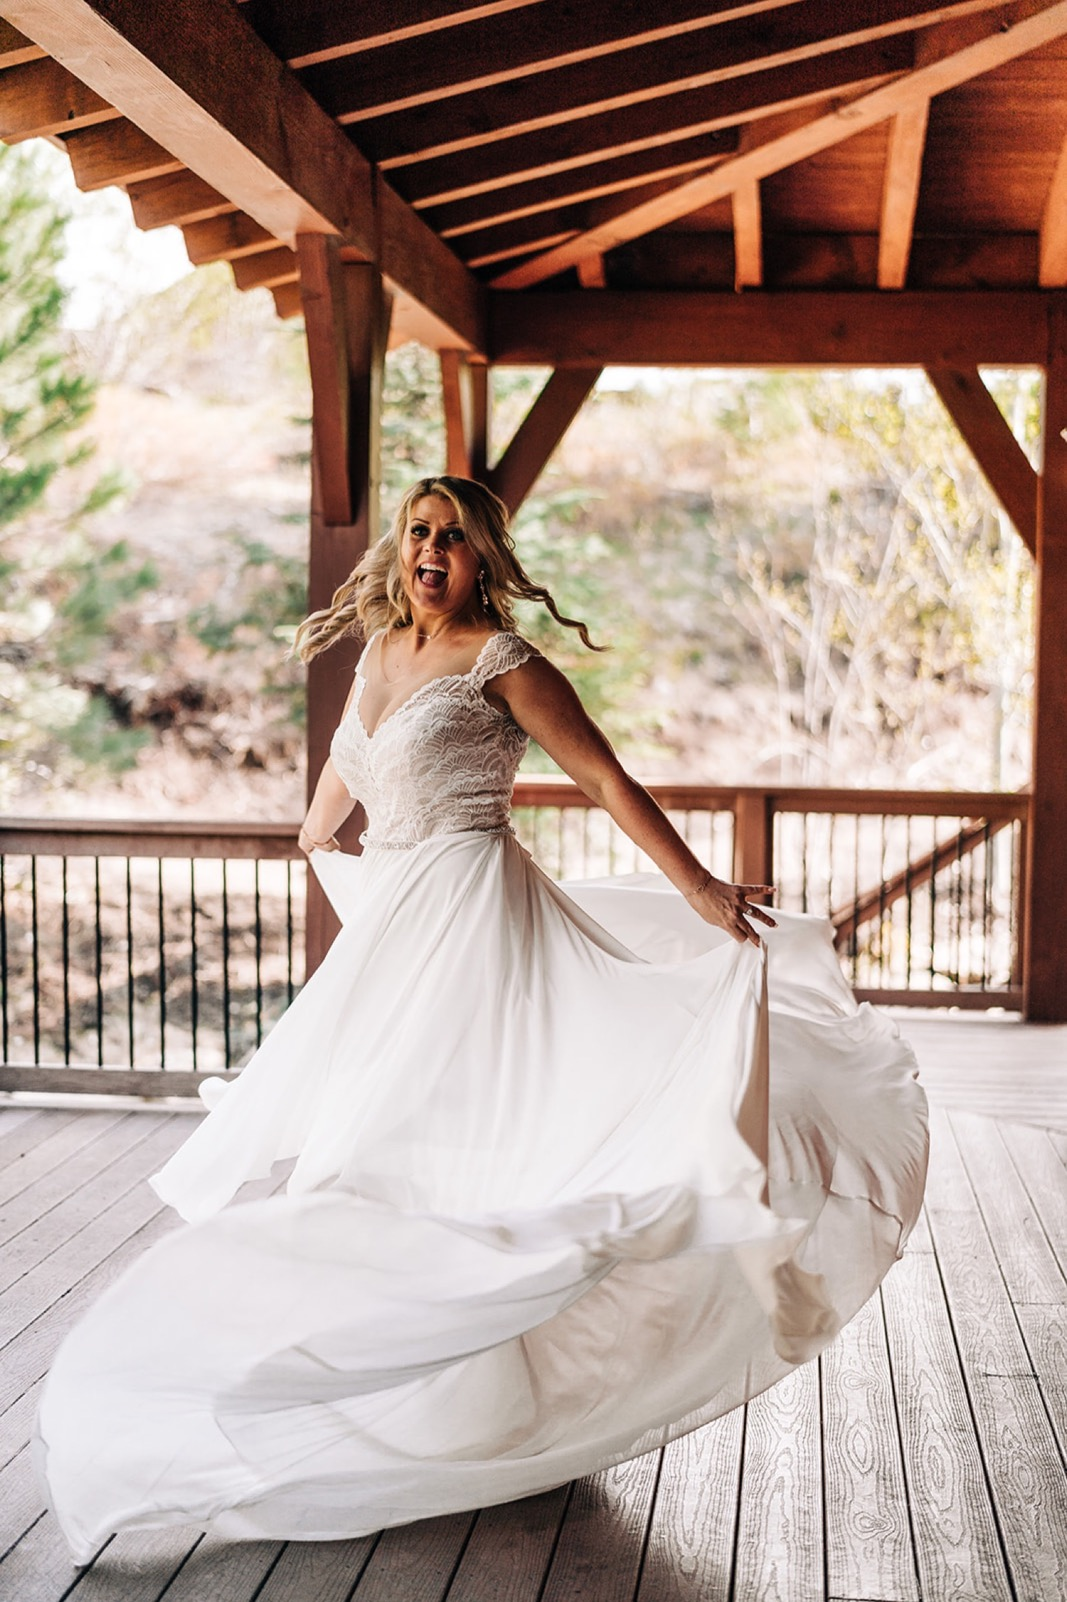 125_falissa_heather_wedding-387.jpg